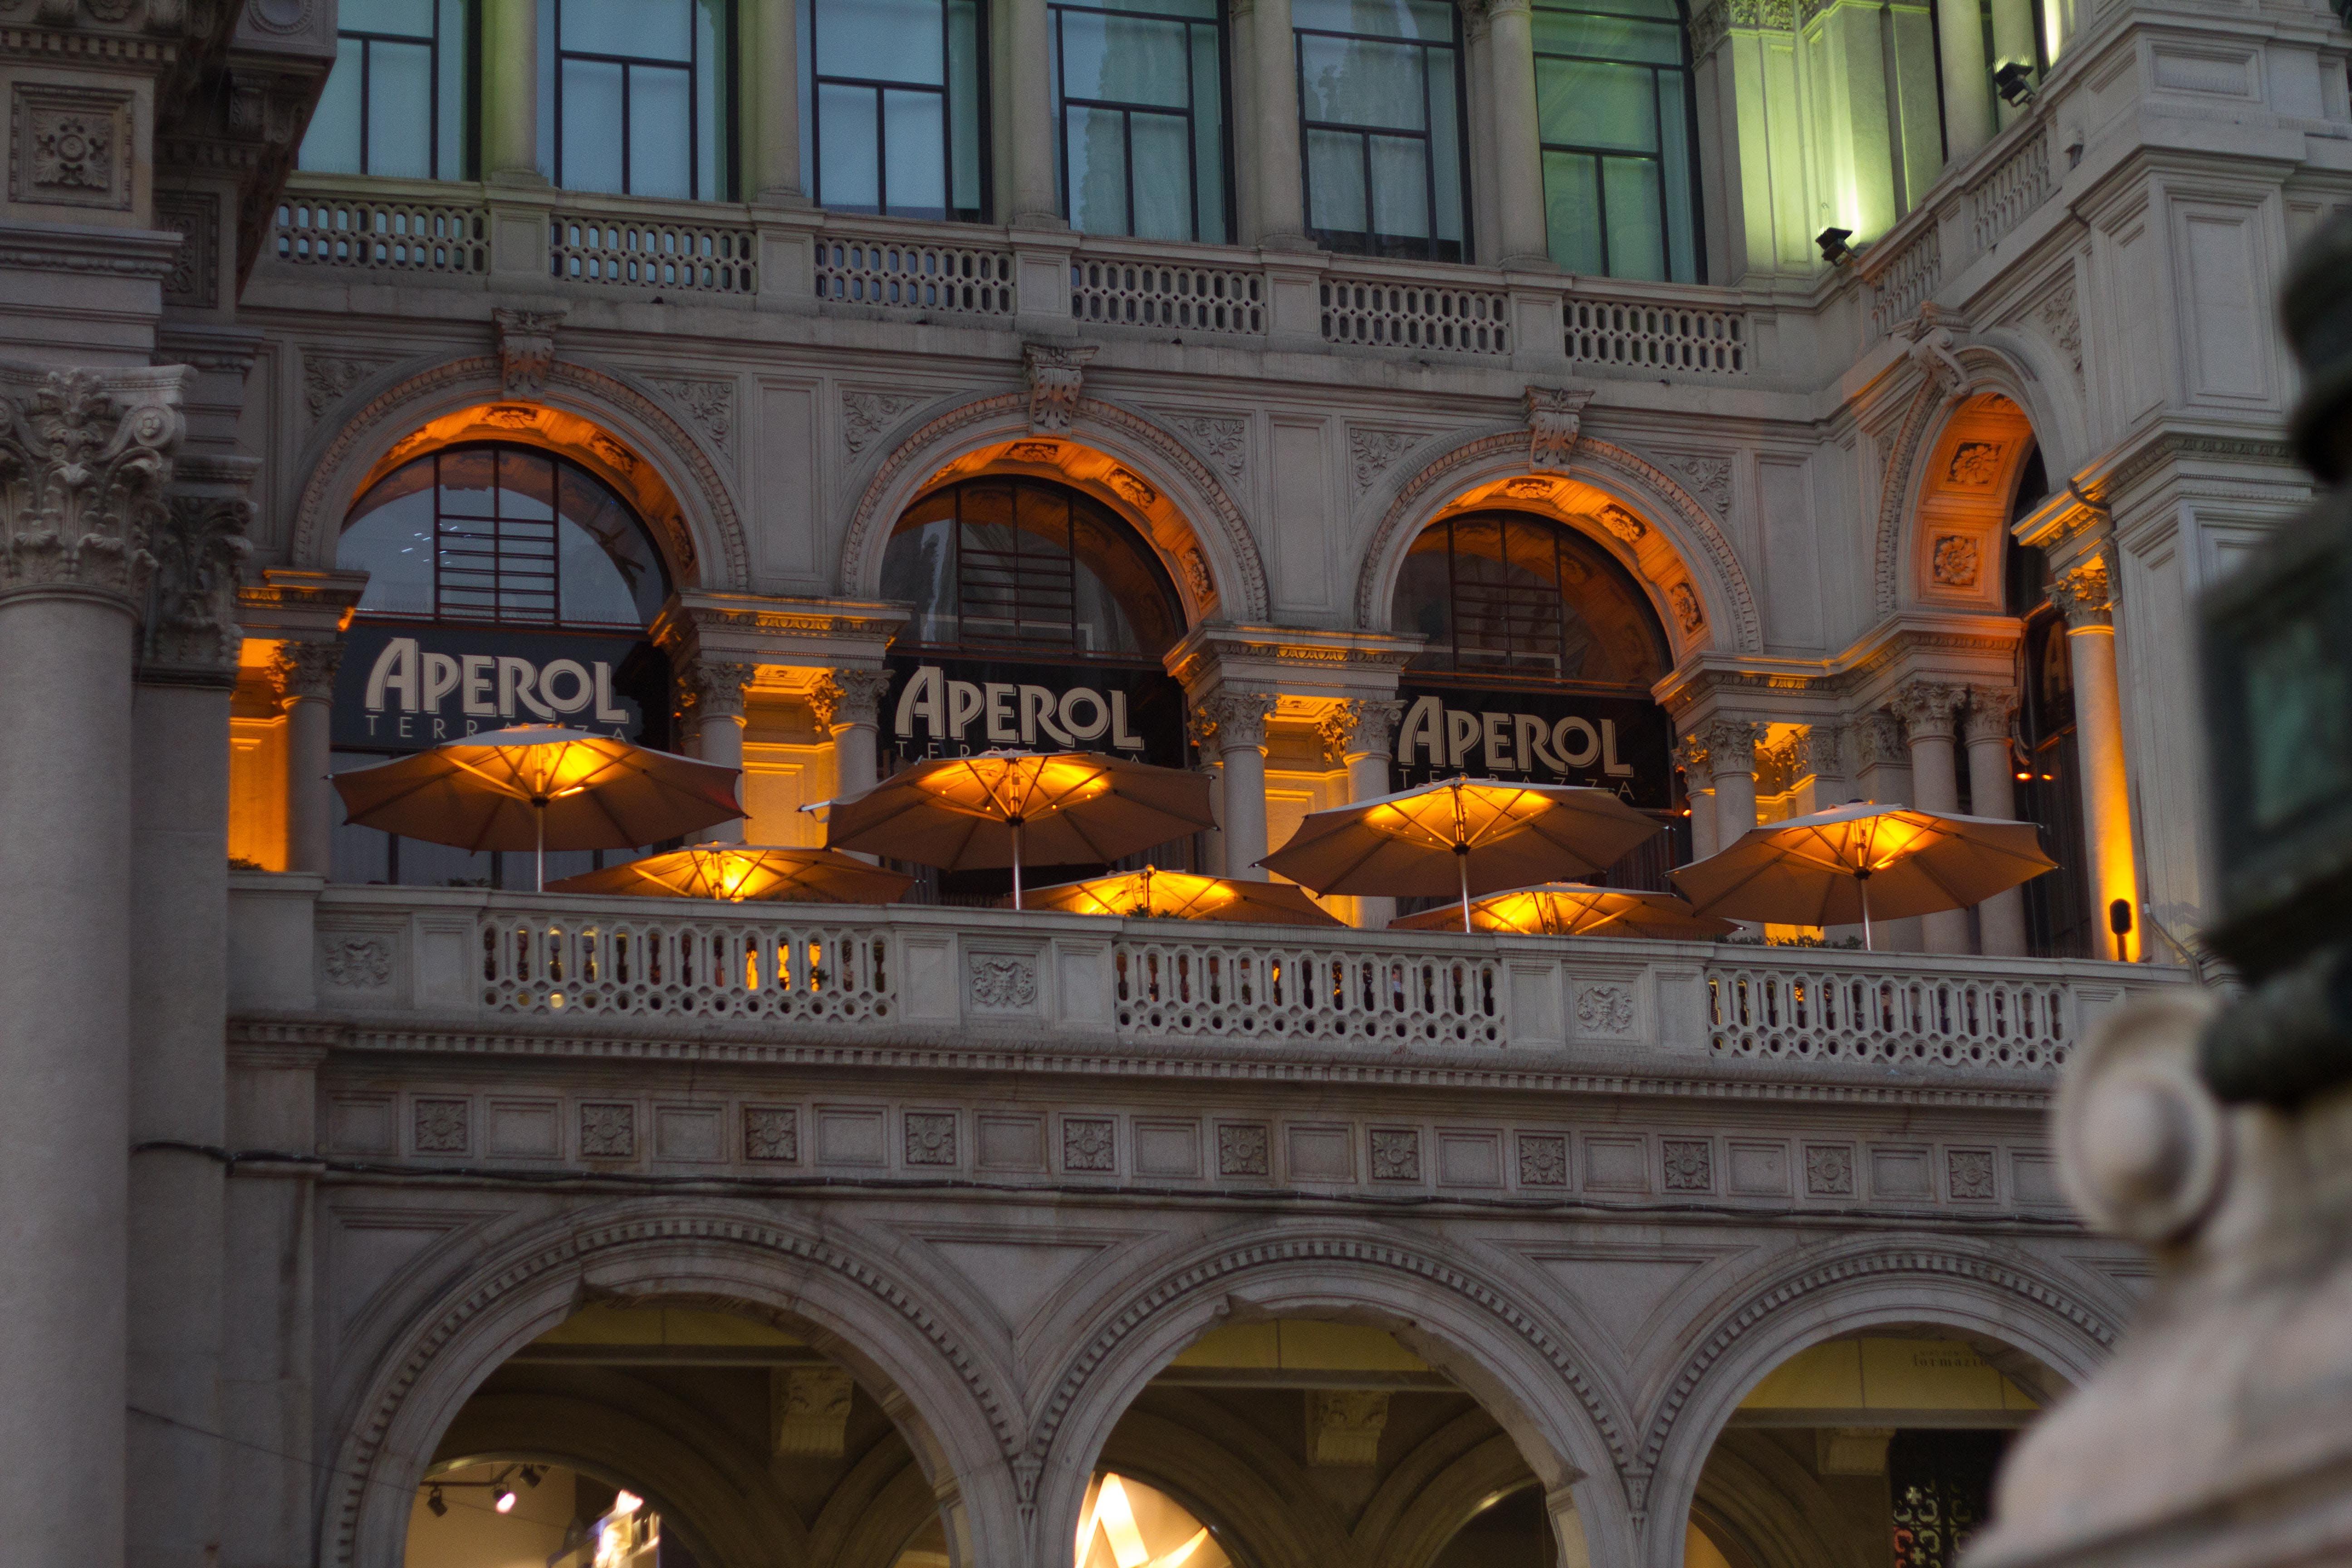 arkitektur, balkong, berømt